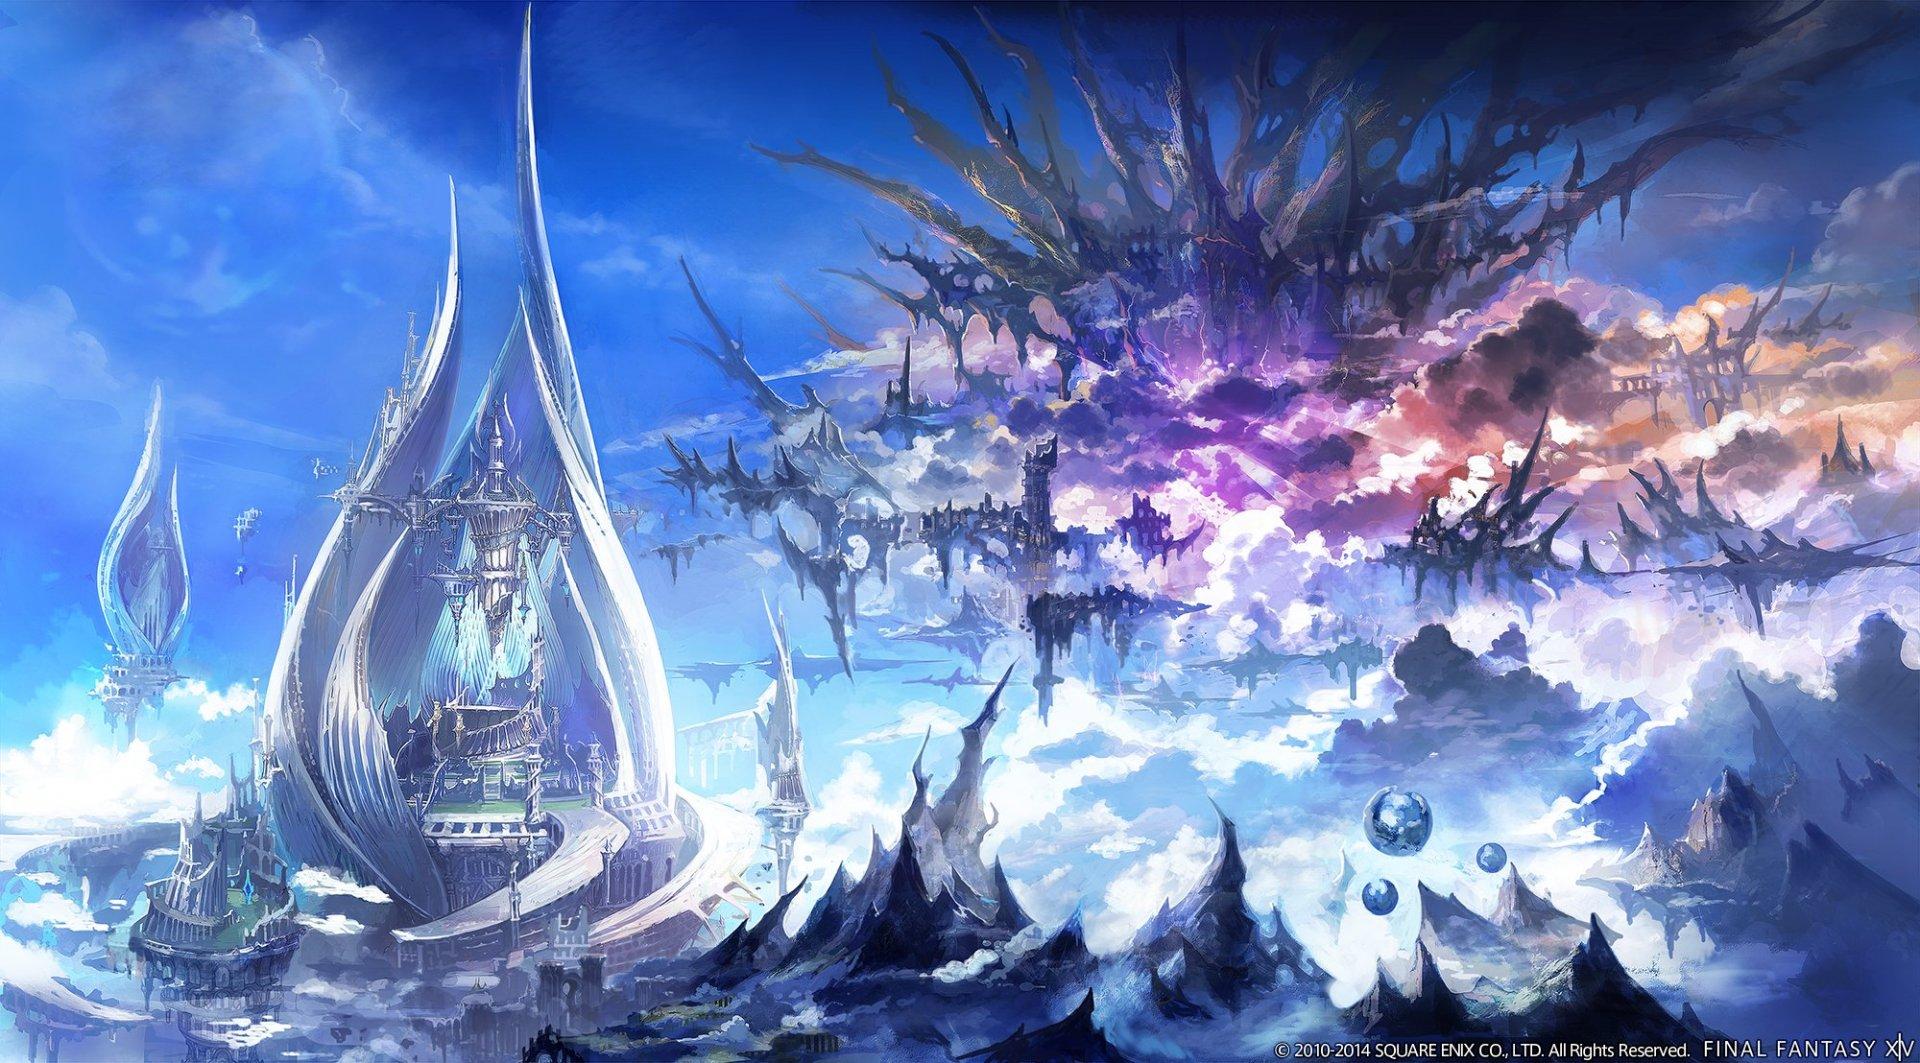 Final Fantasy XIV A Realm Reborn Final Fantasy Realm Reborn Wallpaper 1920x1063